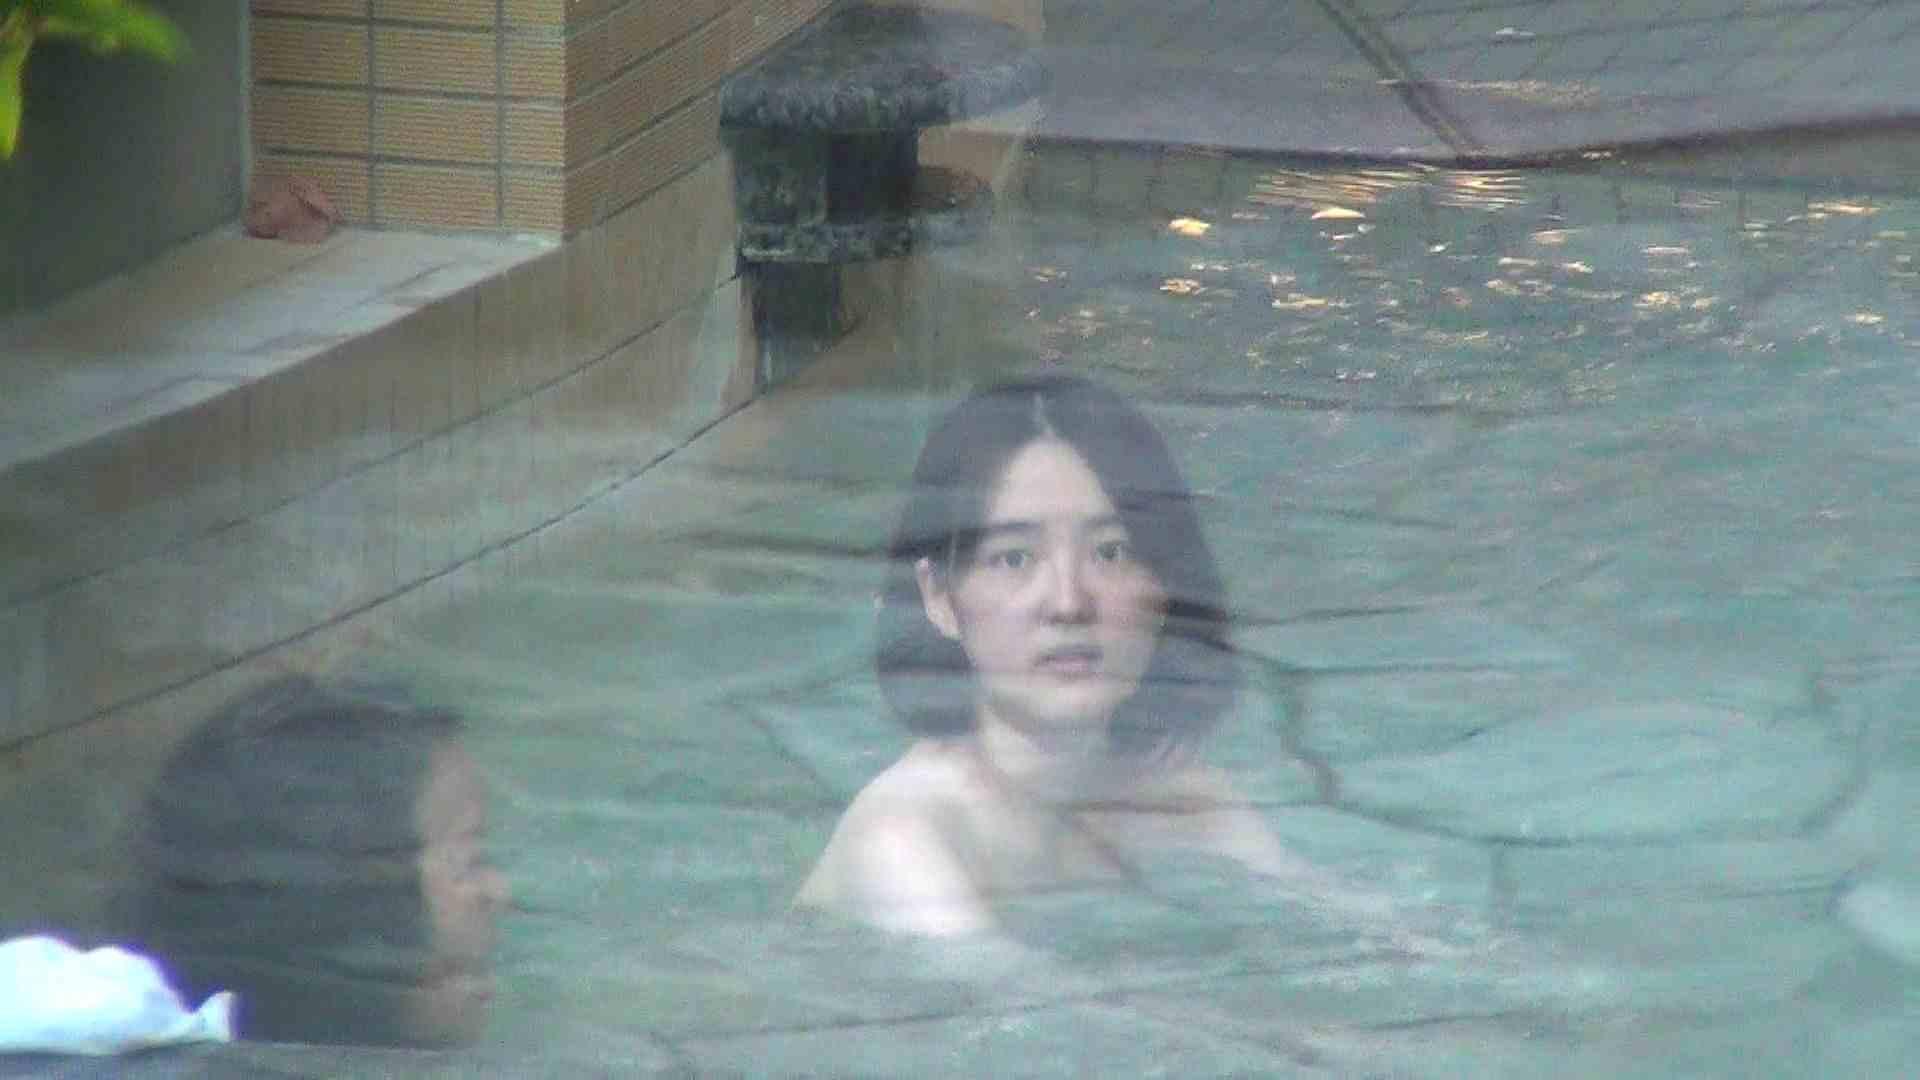 Aquaな露天風呂Vol.297 女体盗撮   OL女体  91連発 70